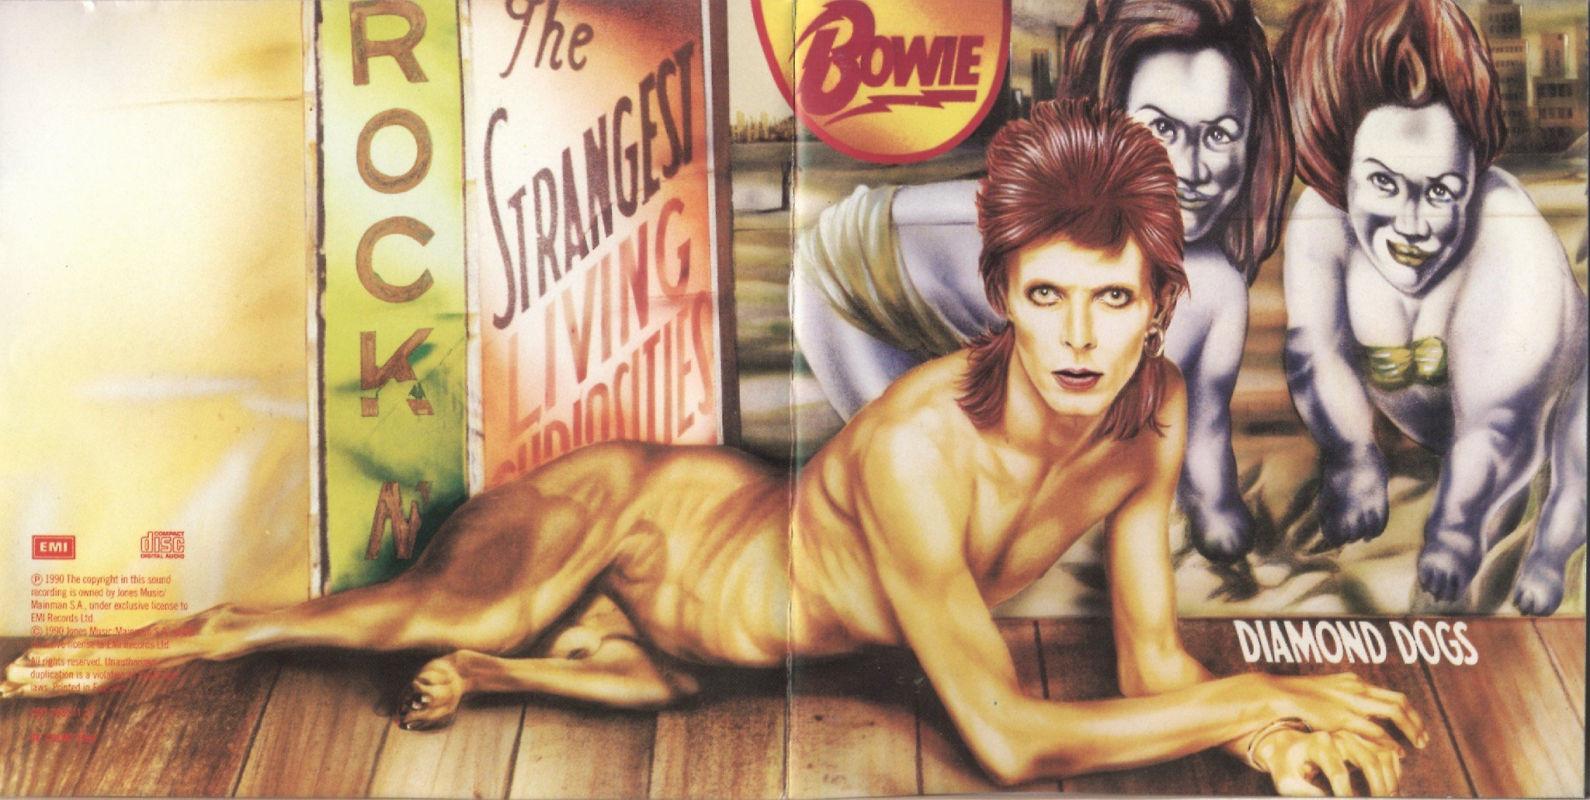 David Bowie – Diamond Dogs (1974) | PEQUENOS CLÁSSICOS PERDIDOS